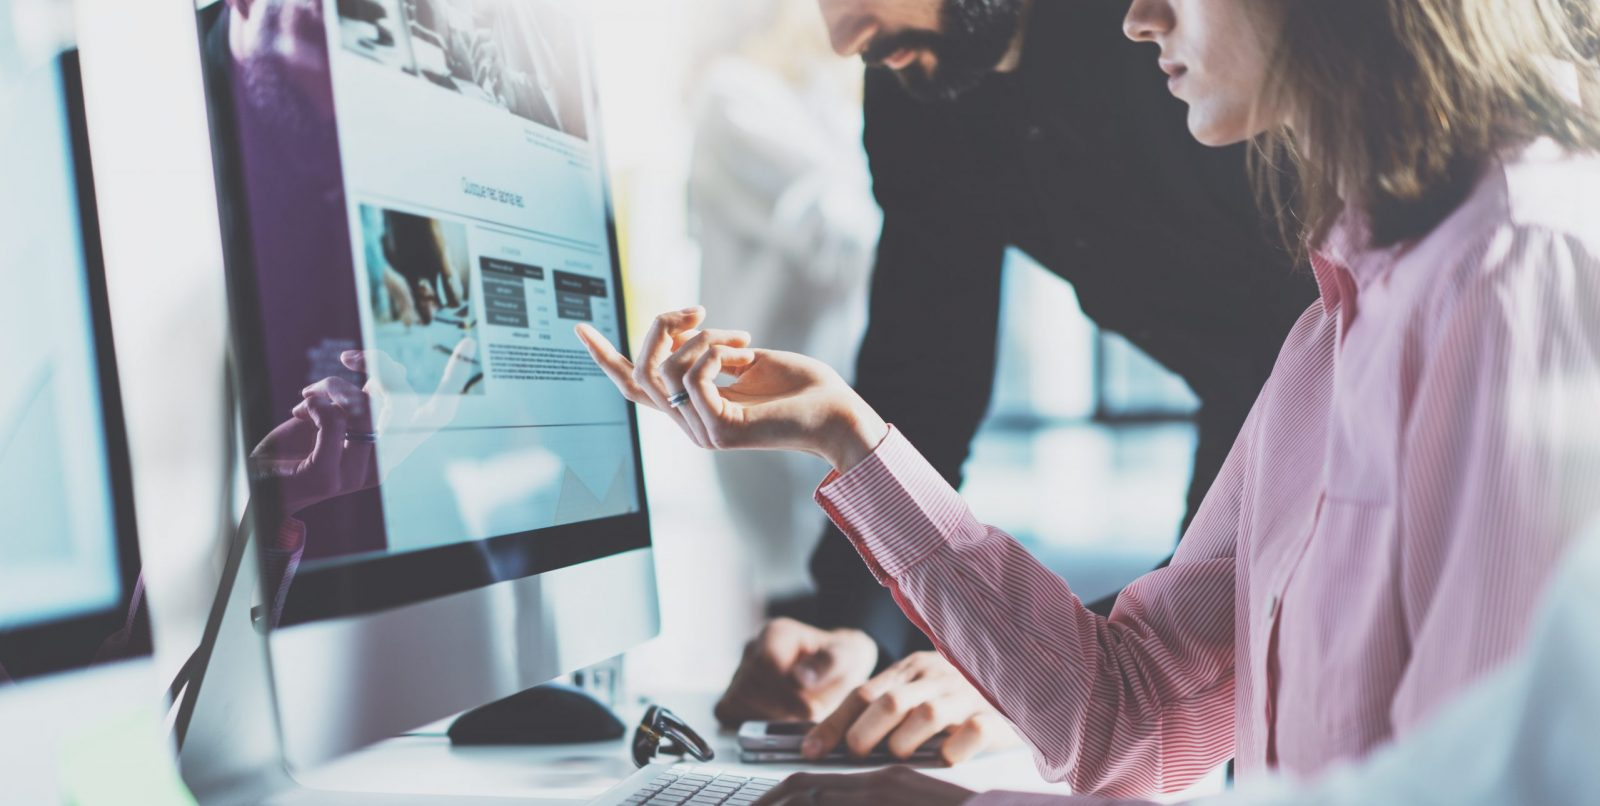 IMAC Digital Marketing